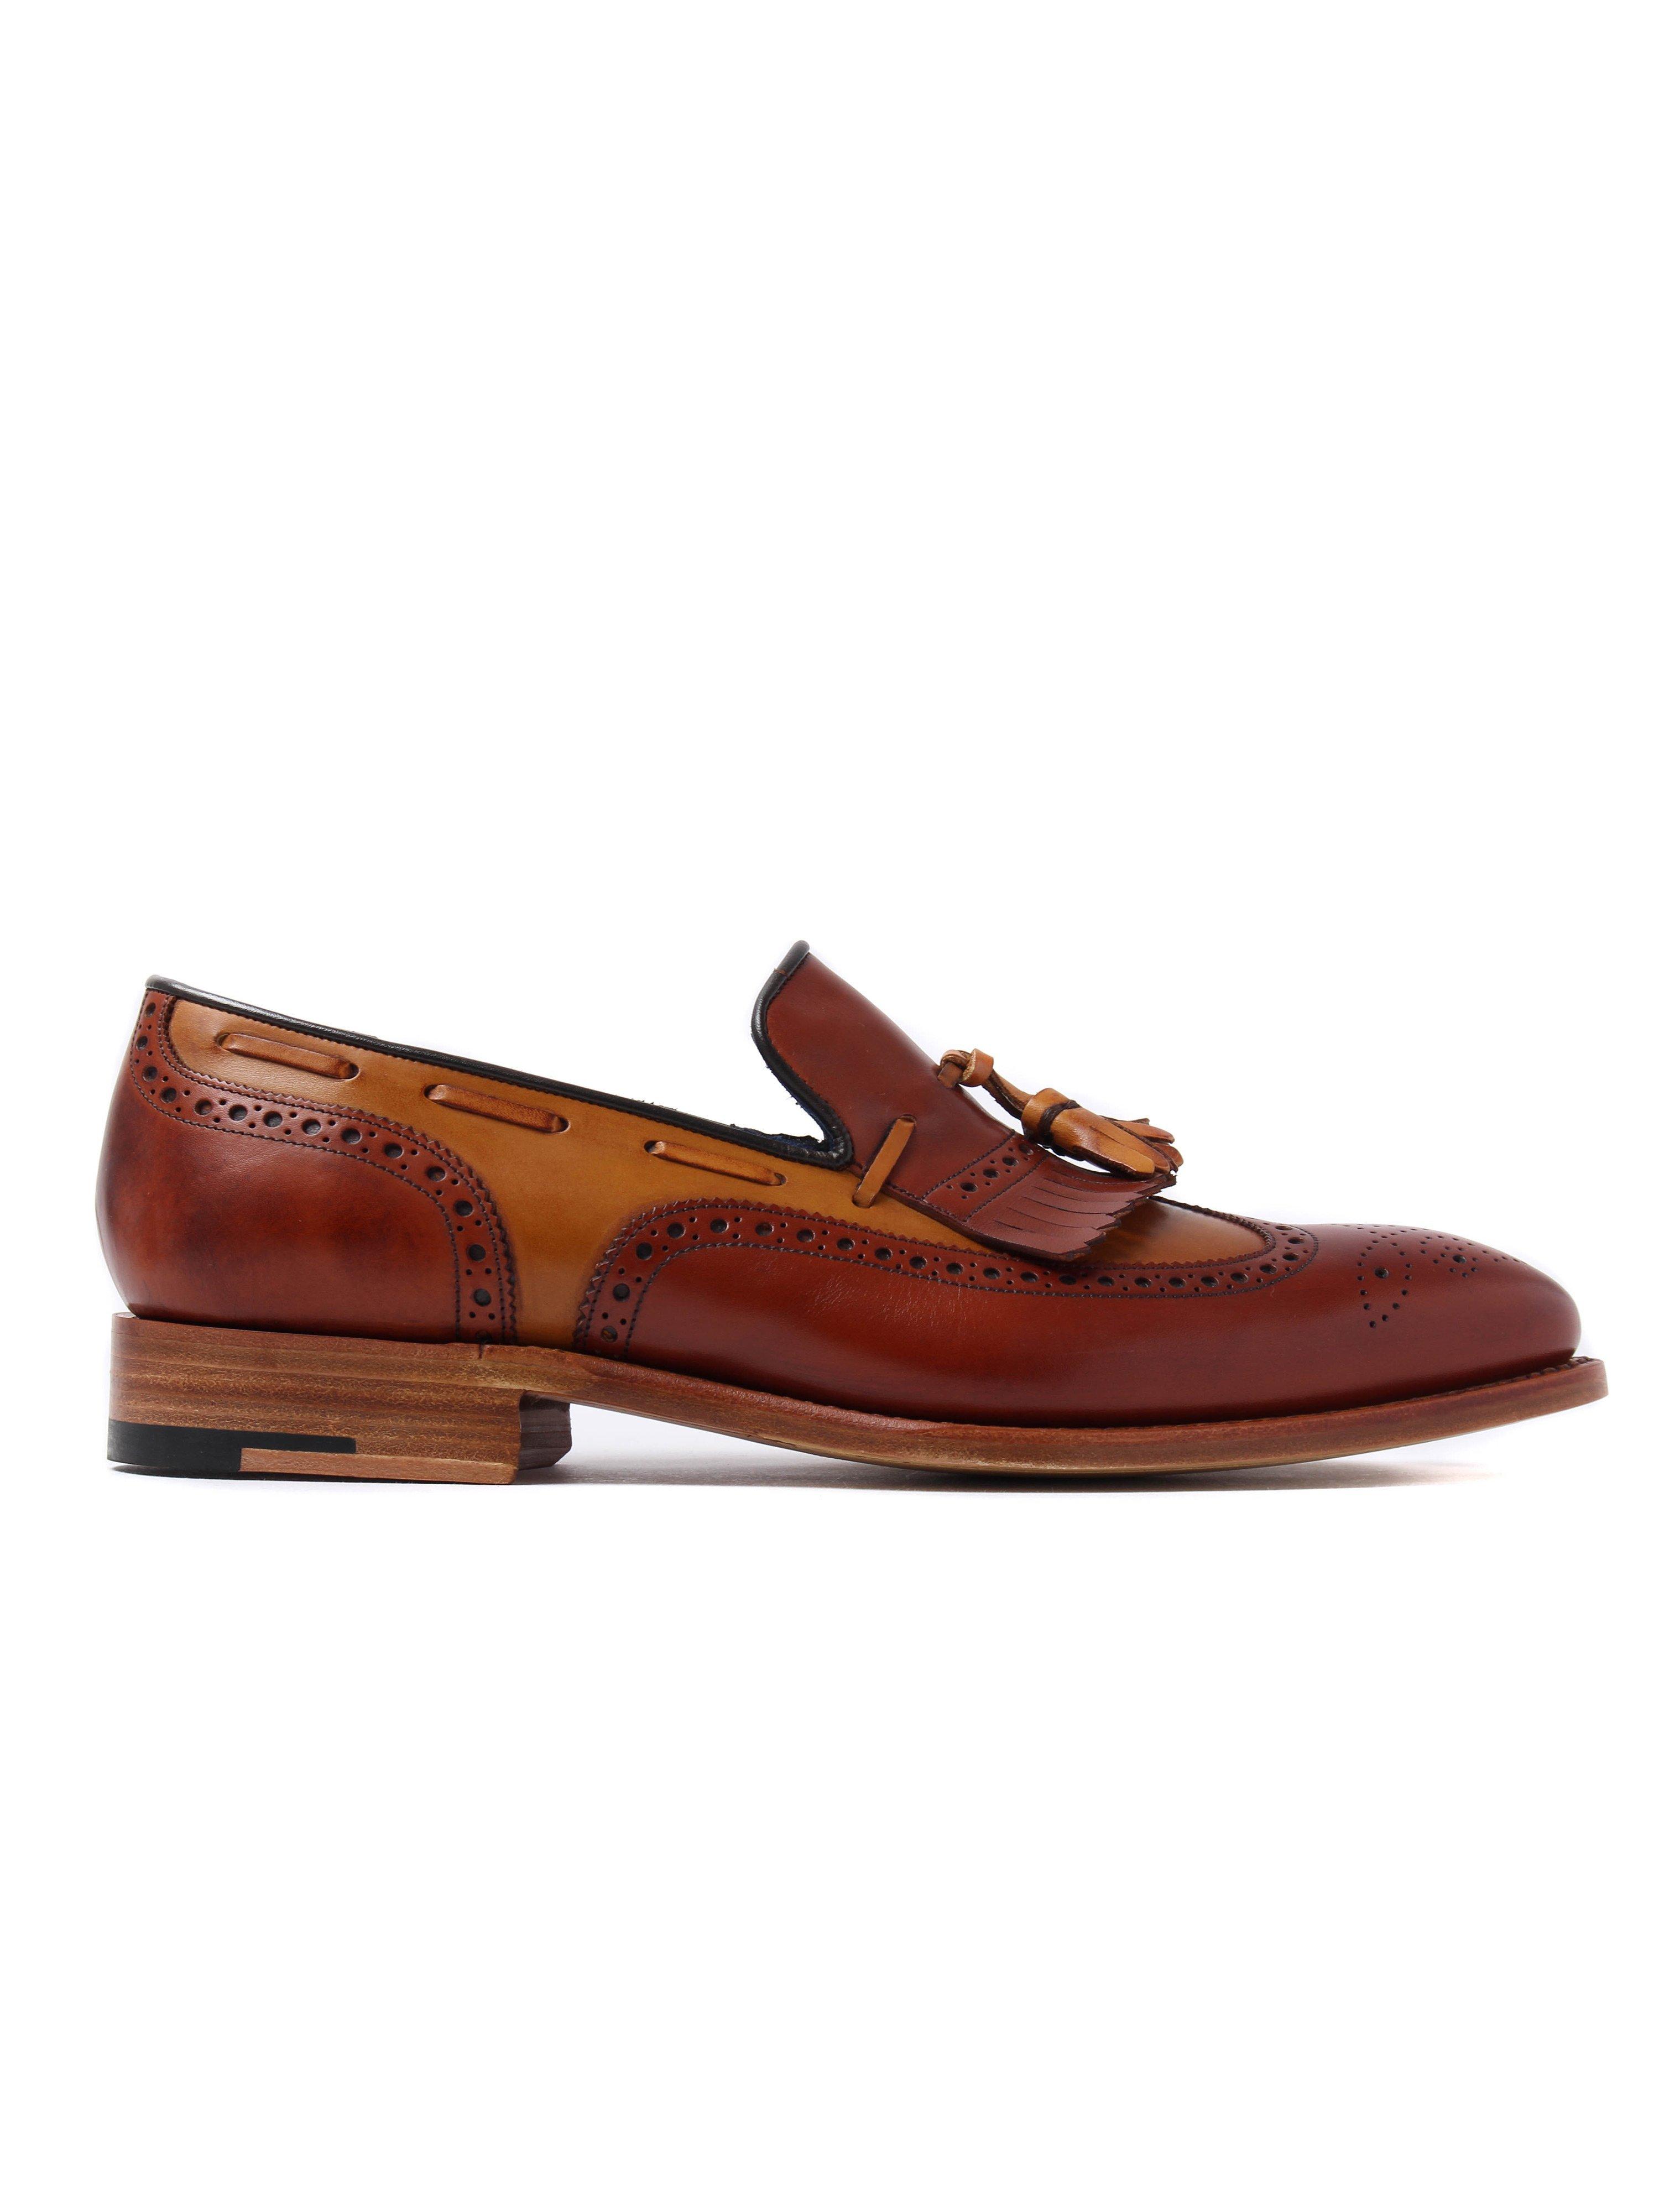 Barker Men's Morgan Leather Tassel Loafers - Cedar & Rosewood